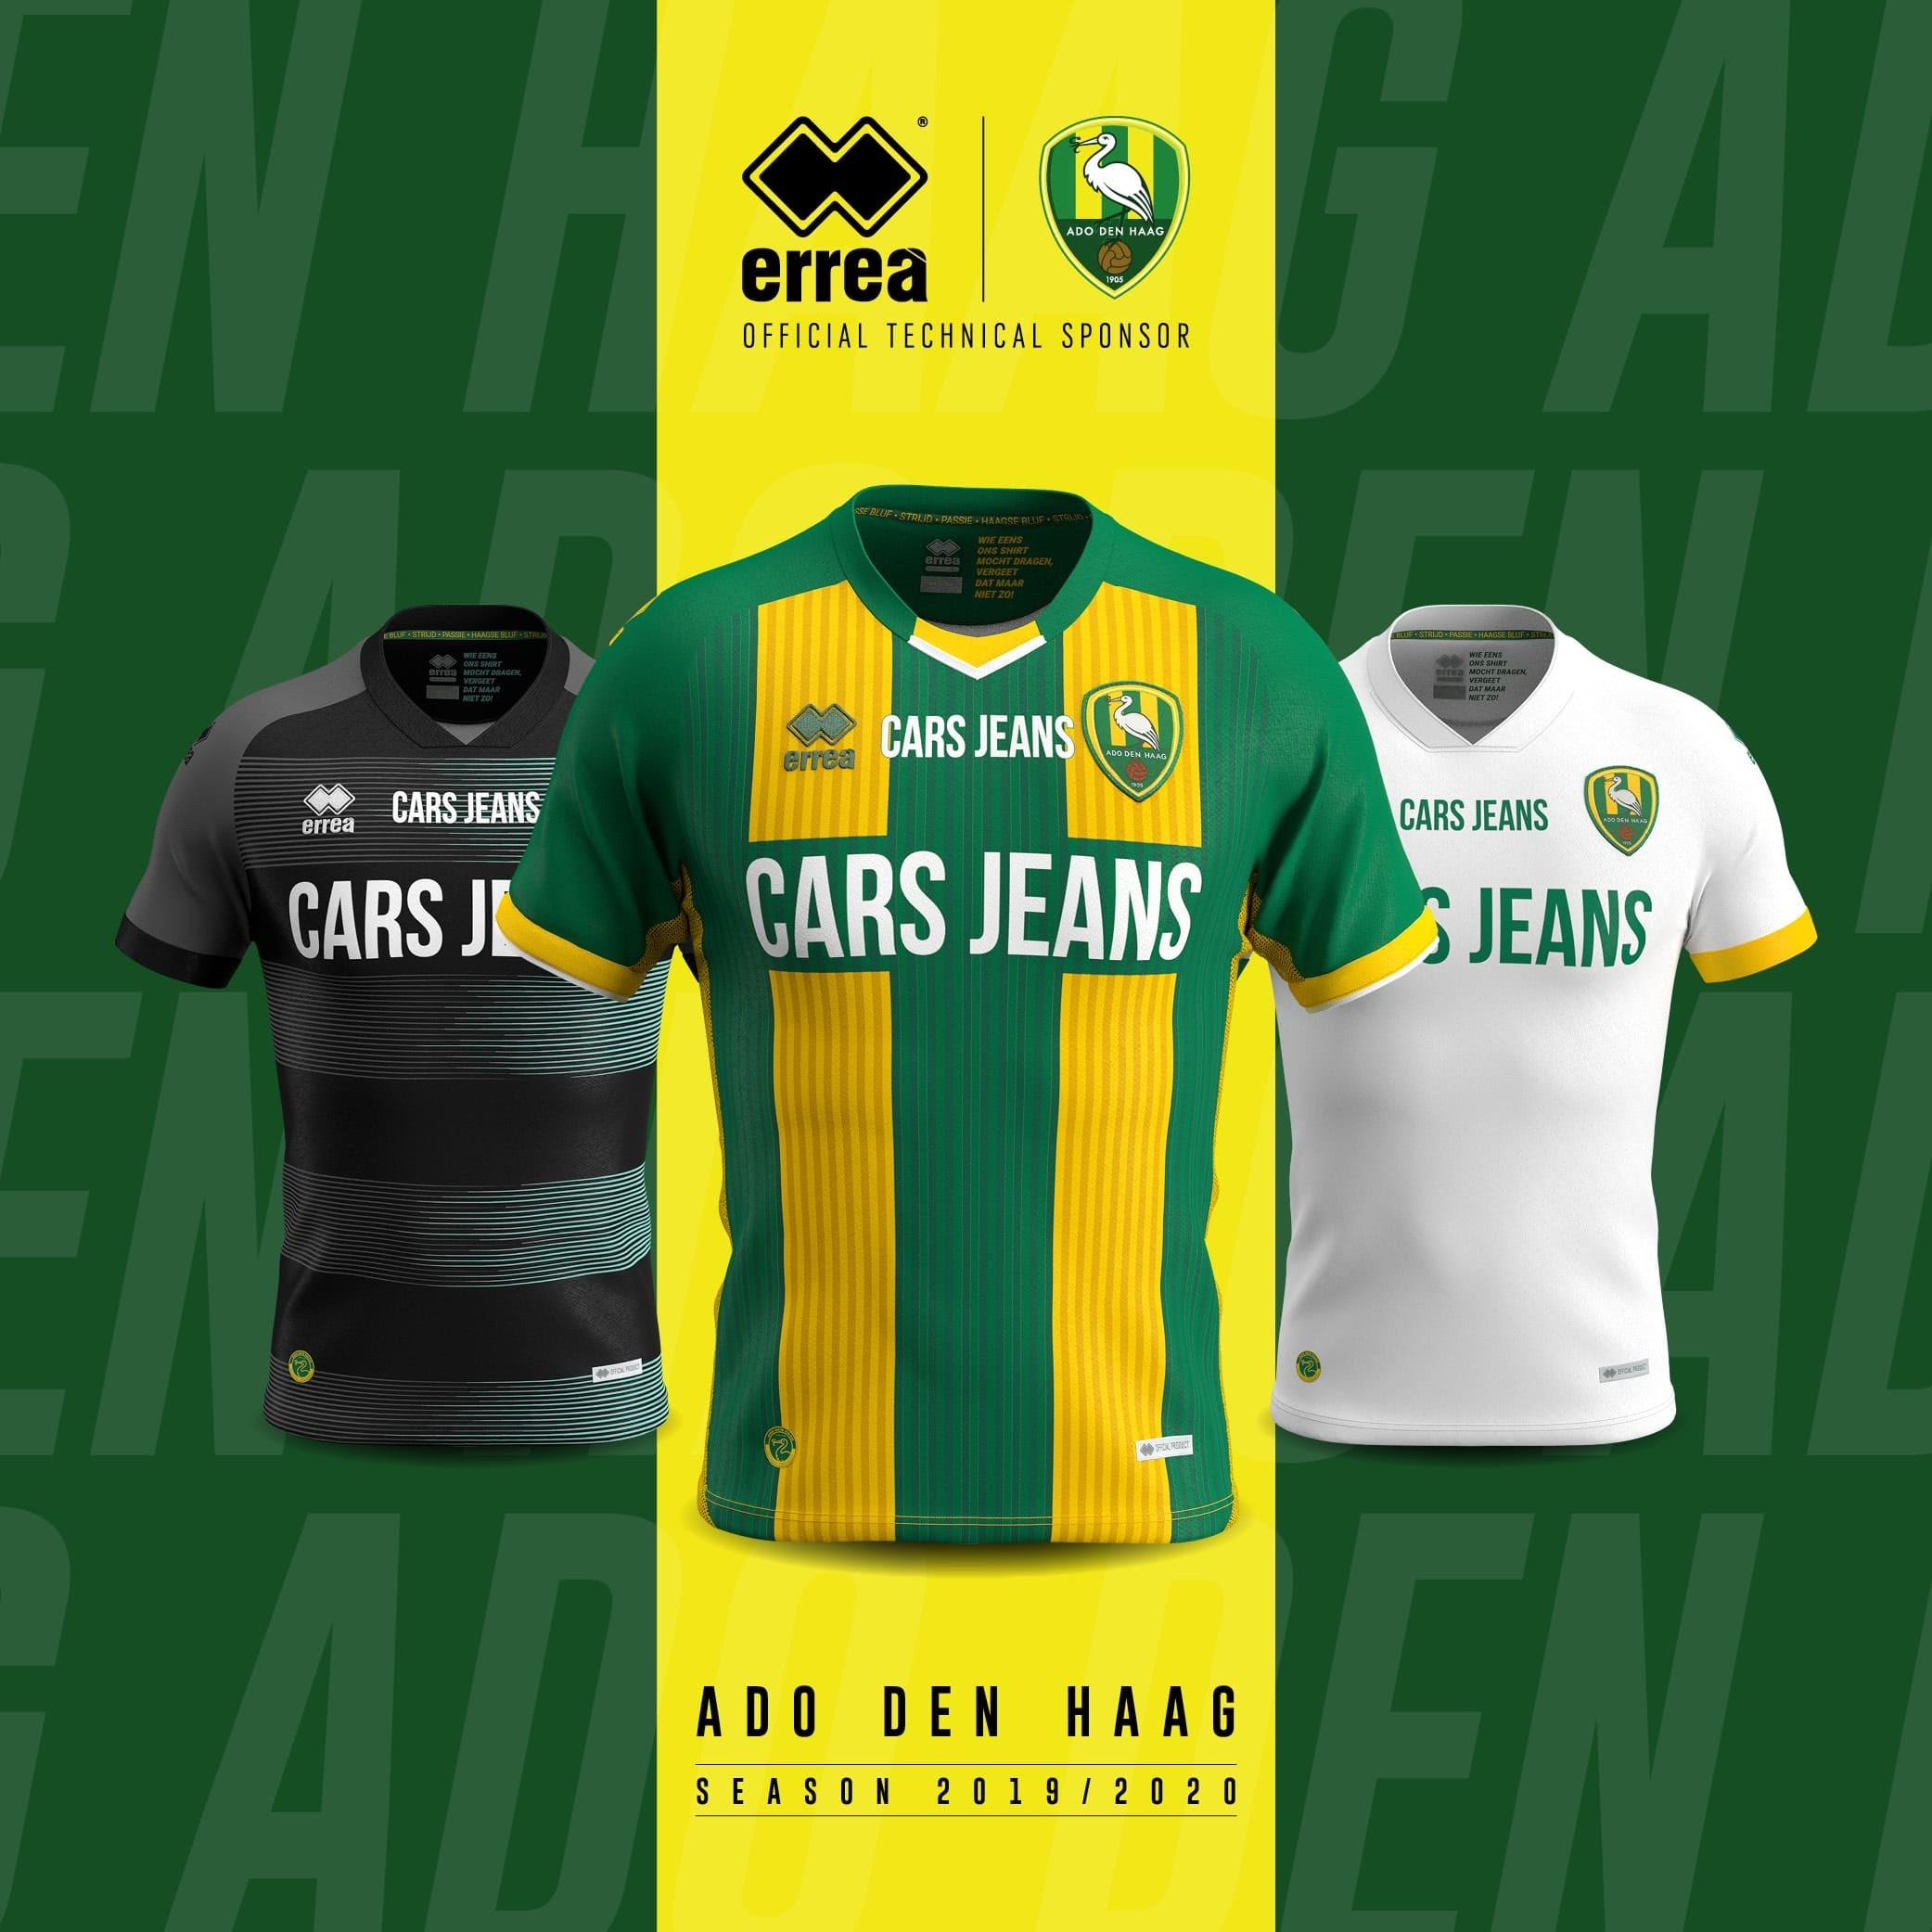 News Innovative Modern And Elegant The New 2019 2020 Kits By Errea Sport For Ado Den Haag Errea